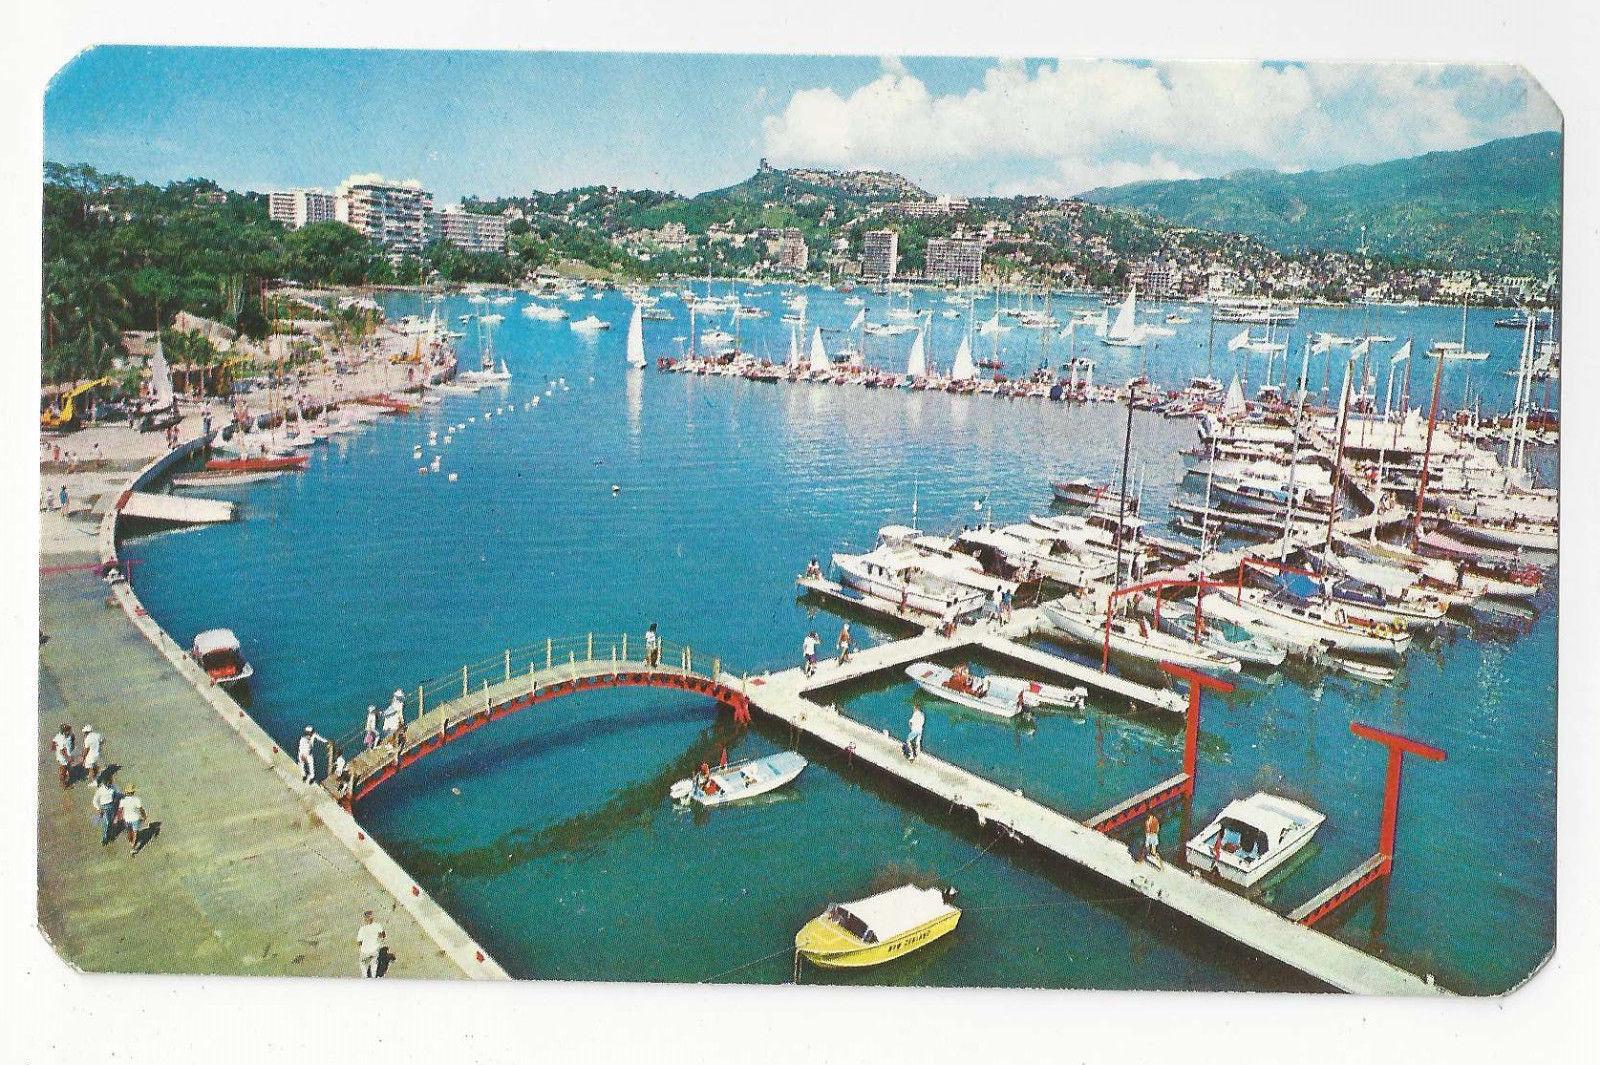 Mexico Acapulco New Yacht Club XIX Olympics 1968 Aerial View Vtg Postcard Boats